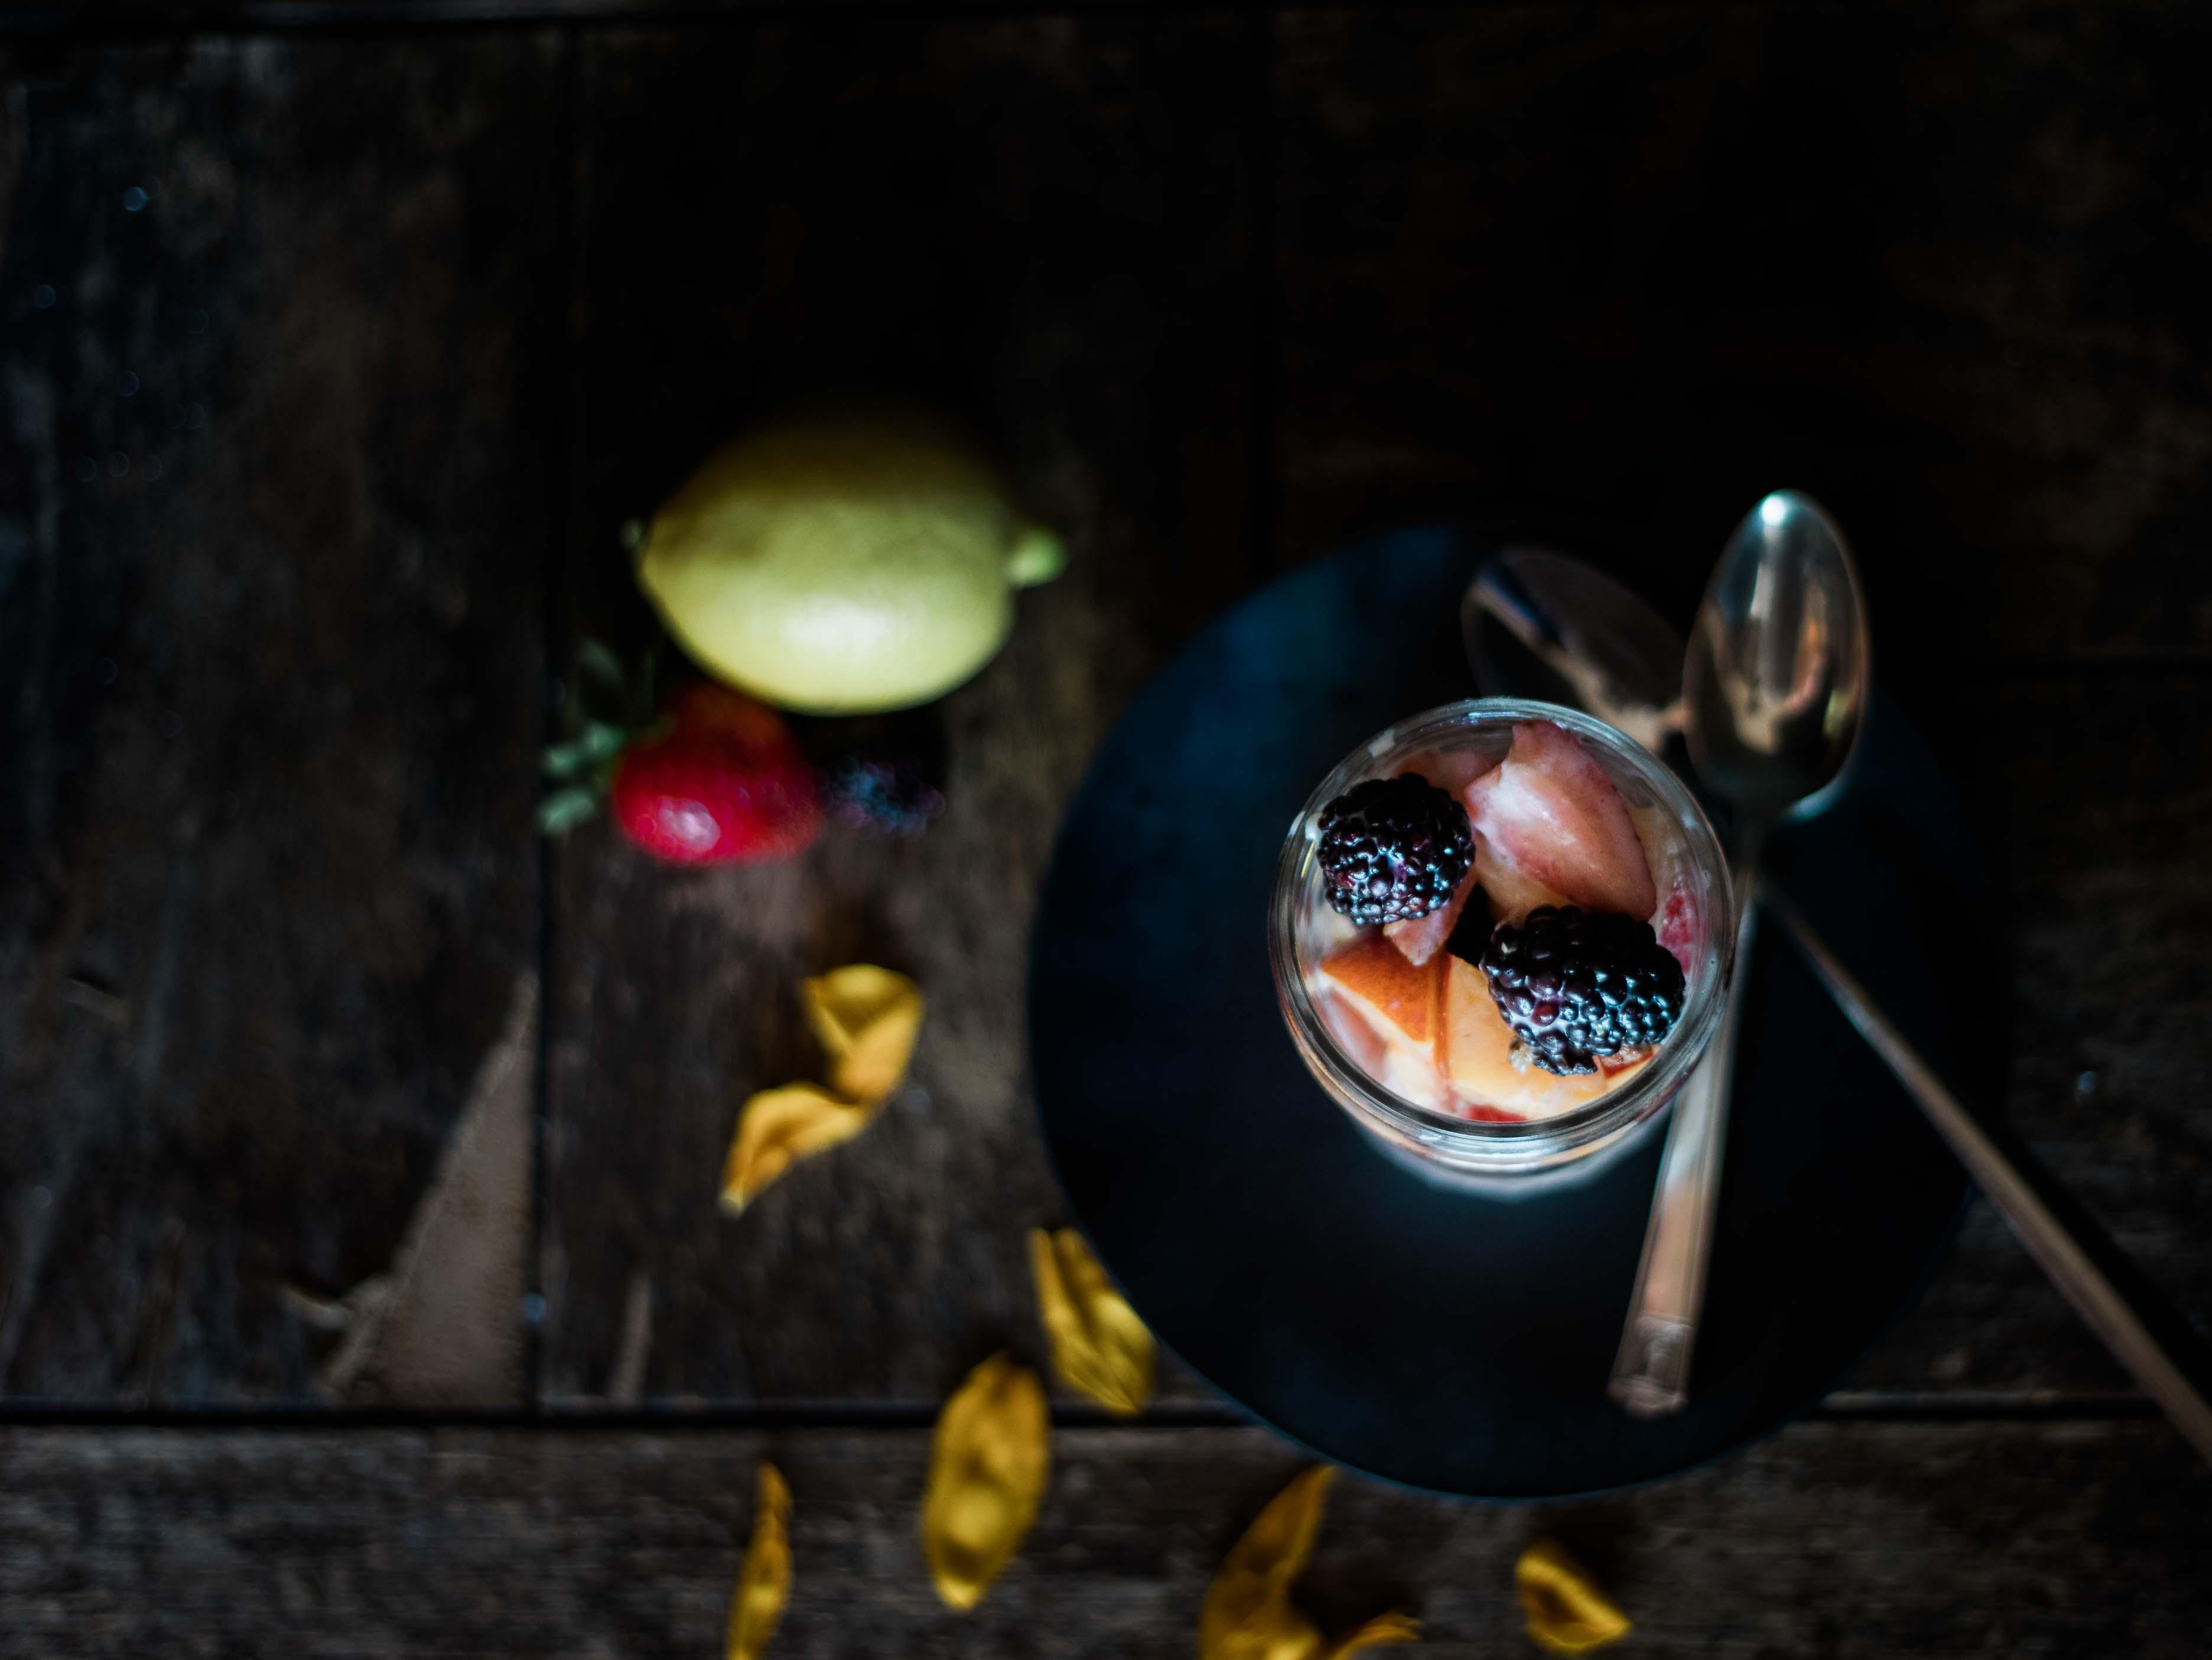 Lemon & Honey Fruit Salad - Secret Life of Bees